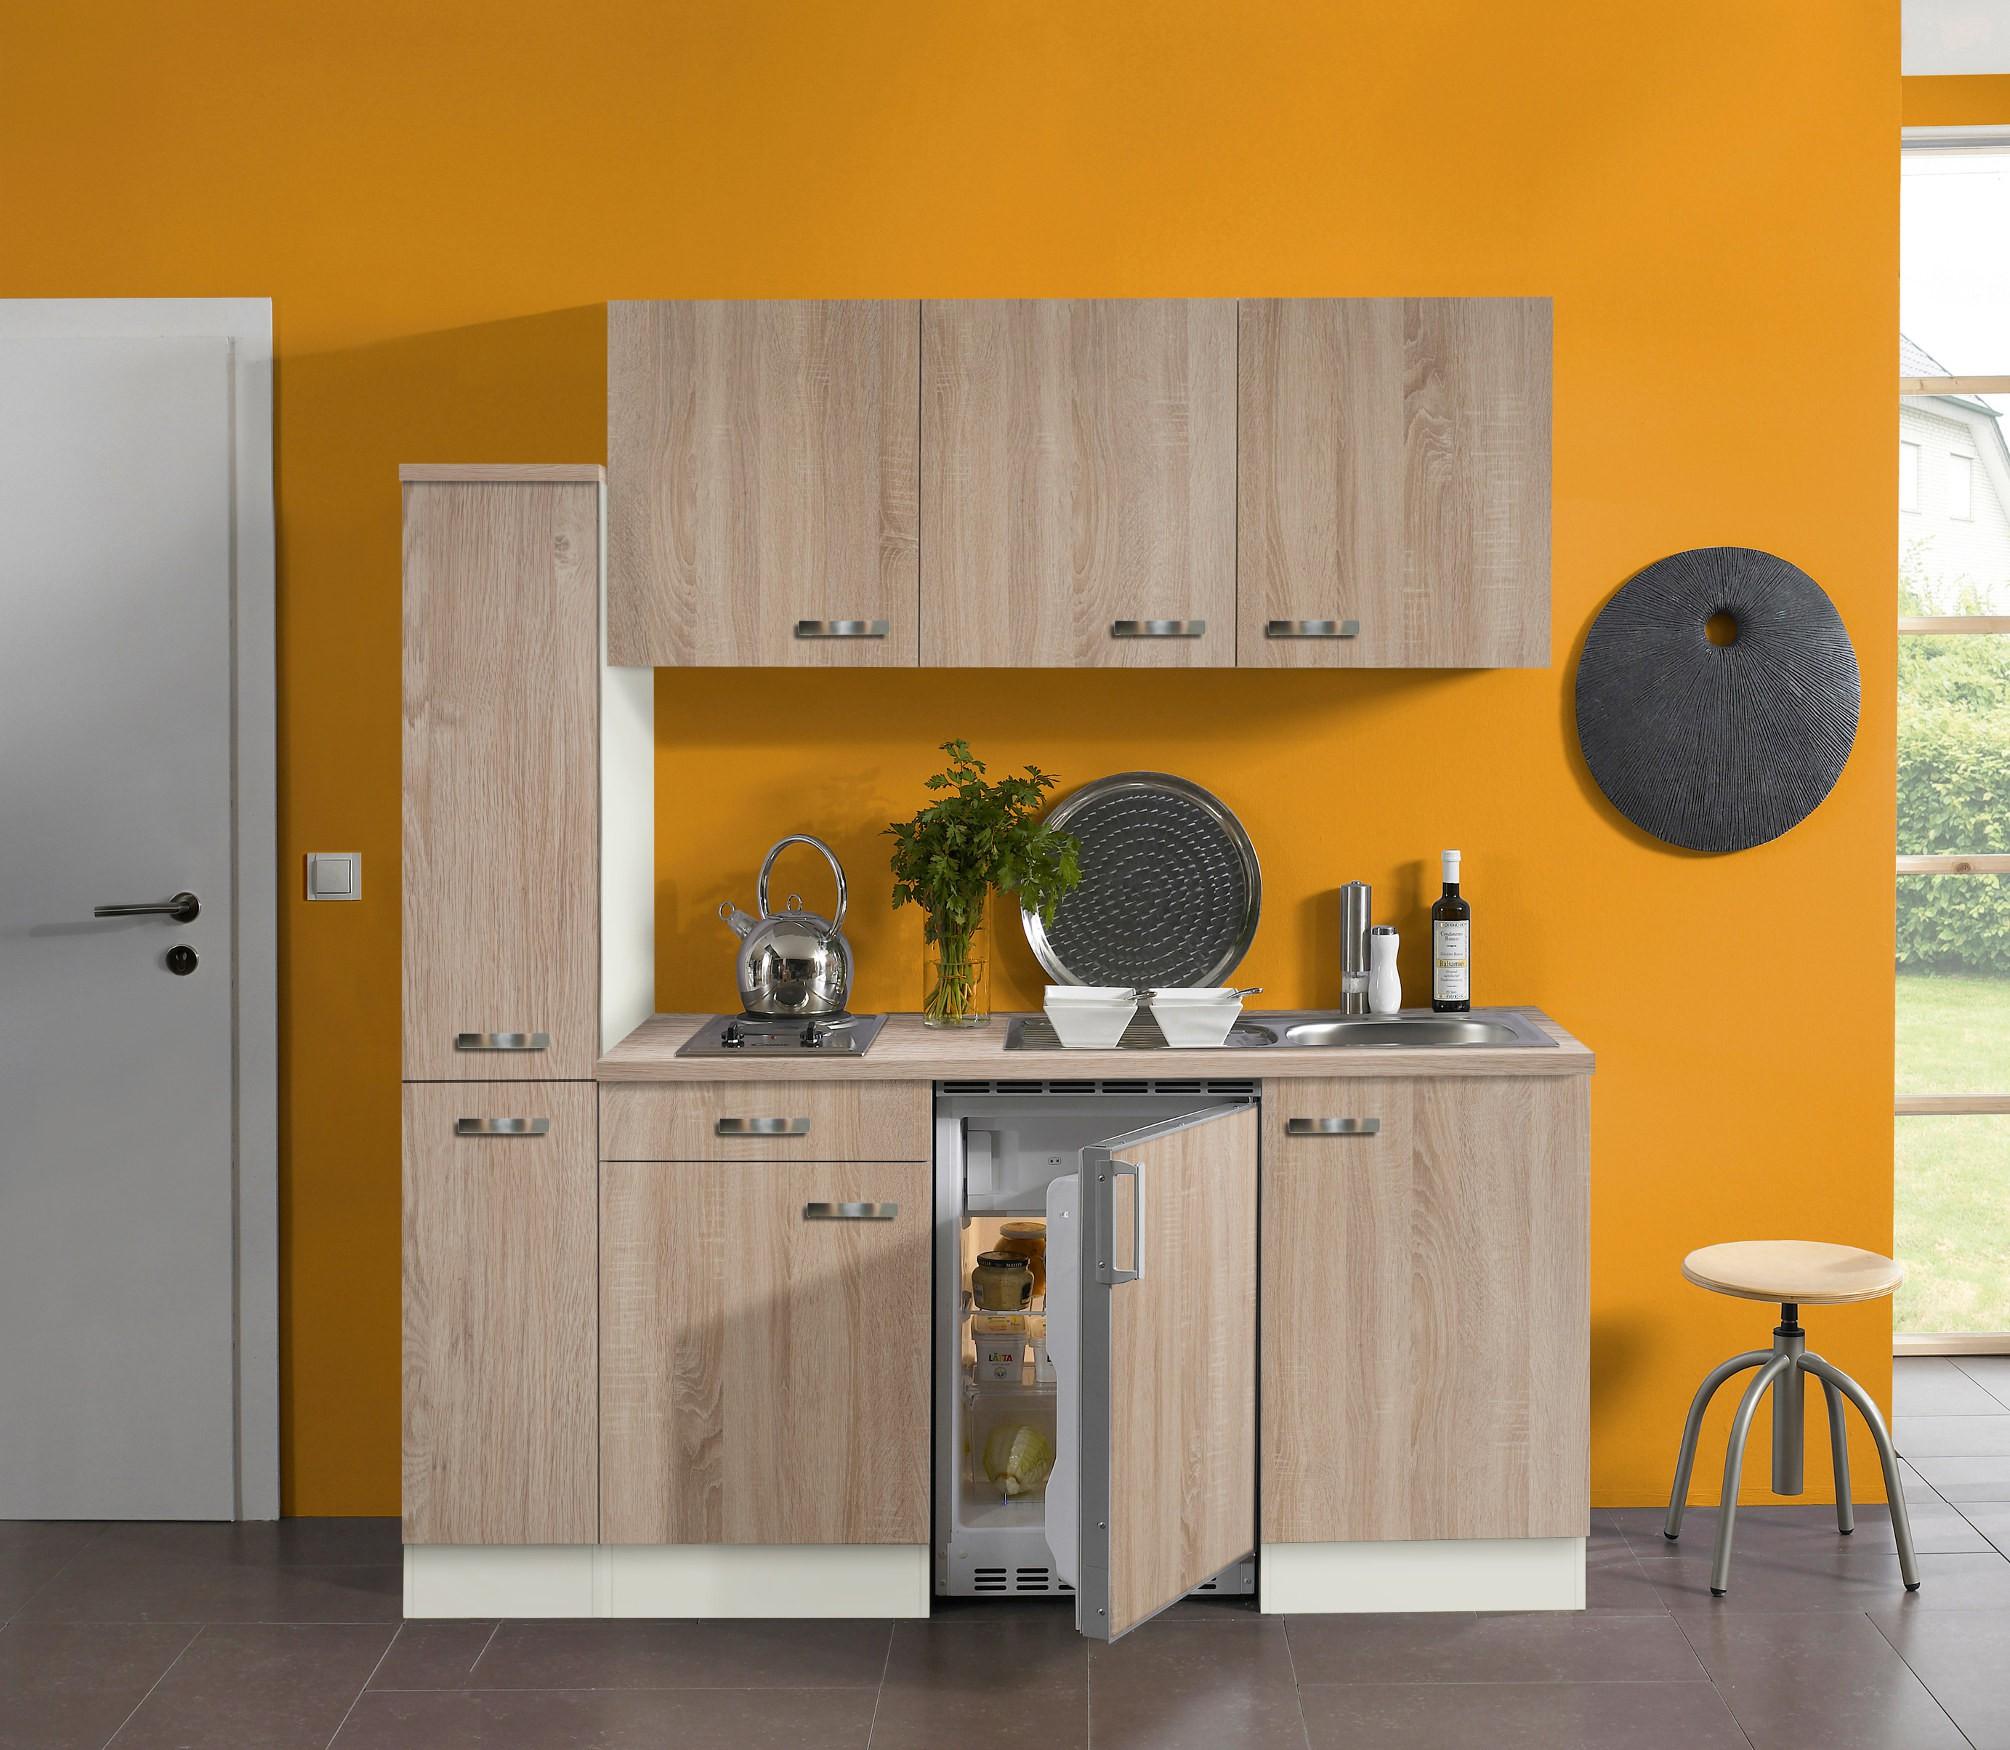 singlek che toledo mit elektro kochfeld 9 teilig breite 180 cm eiche k che singlek chen. Black Bedroom Furniture Sets. Home Design Ideas